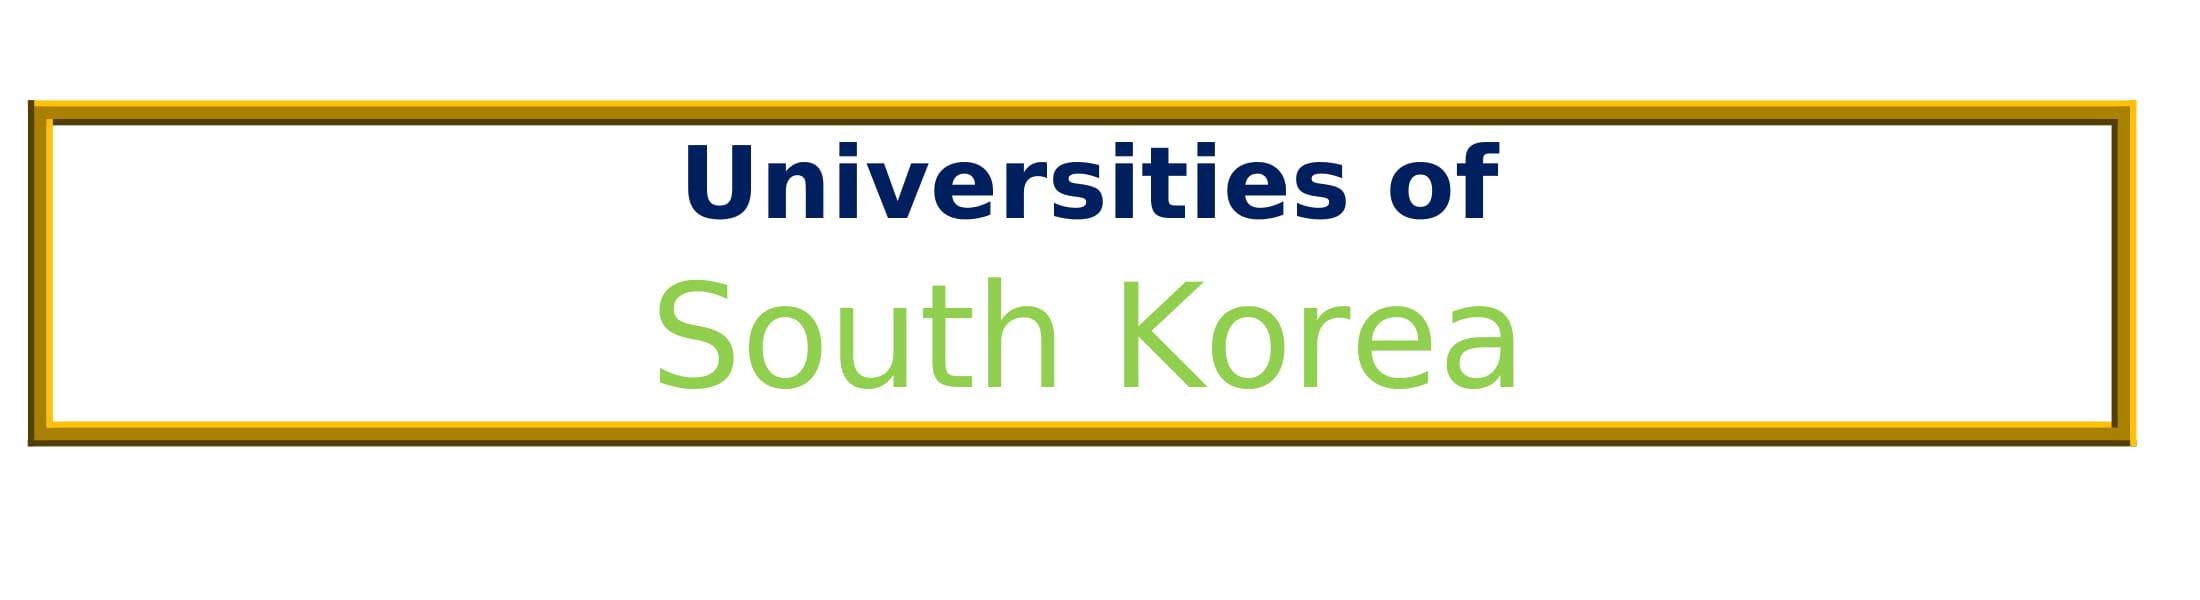 List of Universities in South Korea